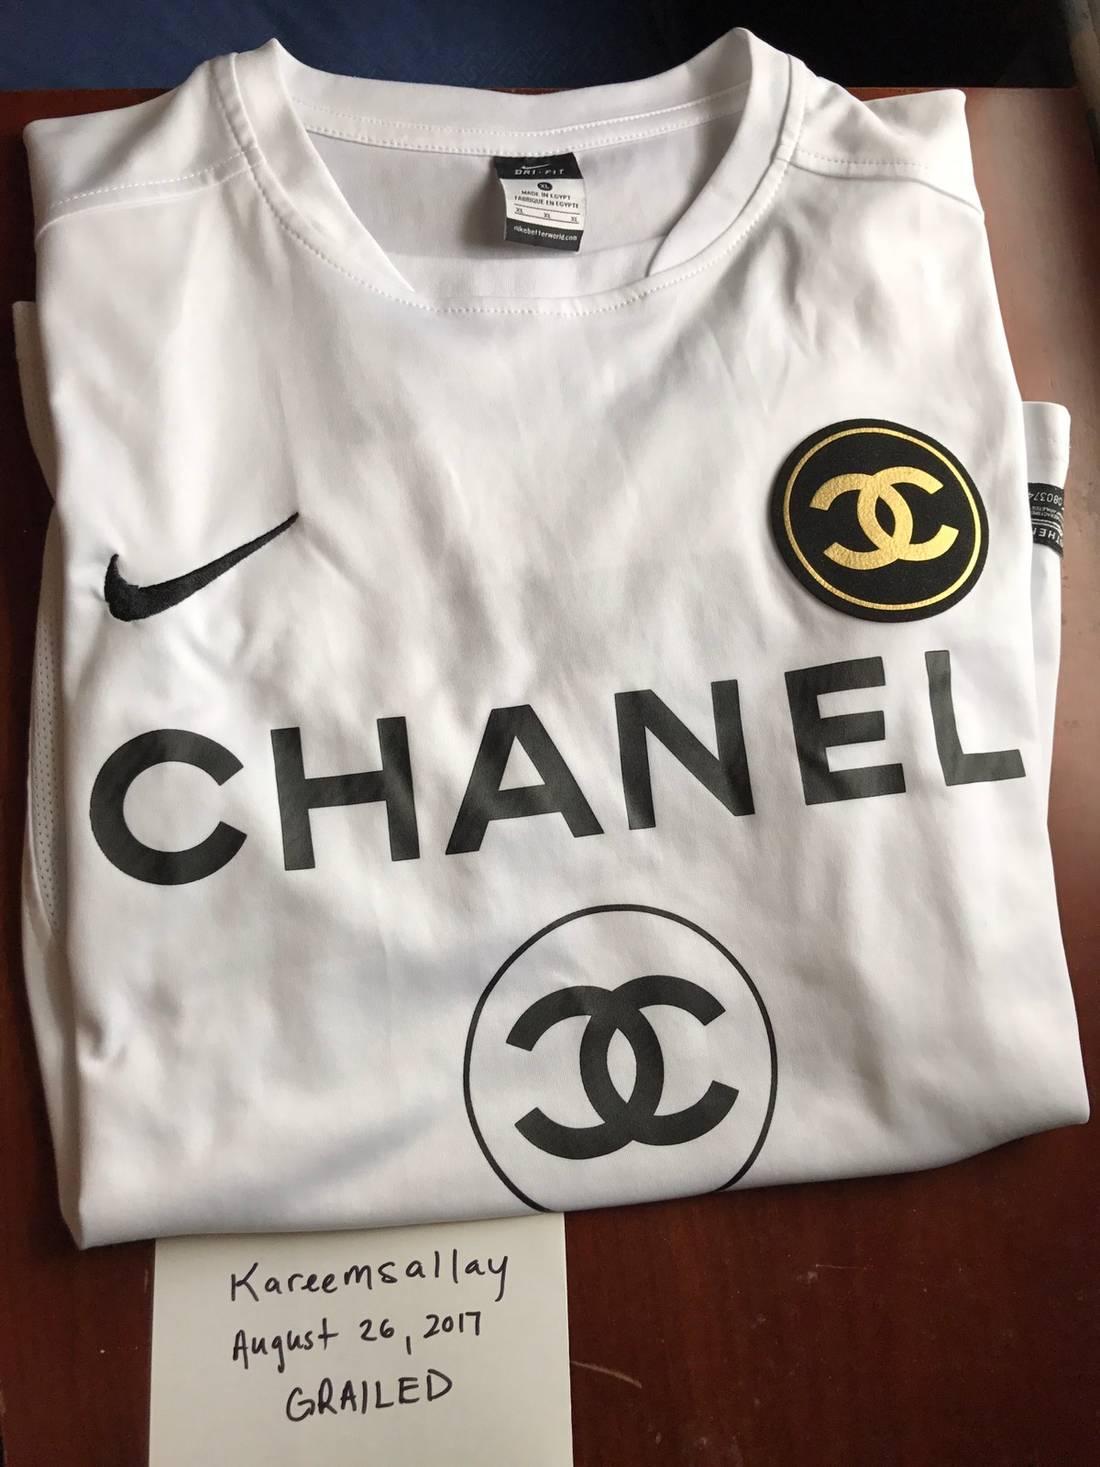 b04a0cc35 Chanel Soccer Jersey Nike